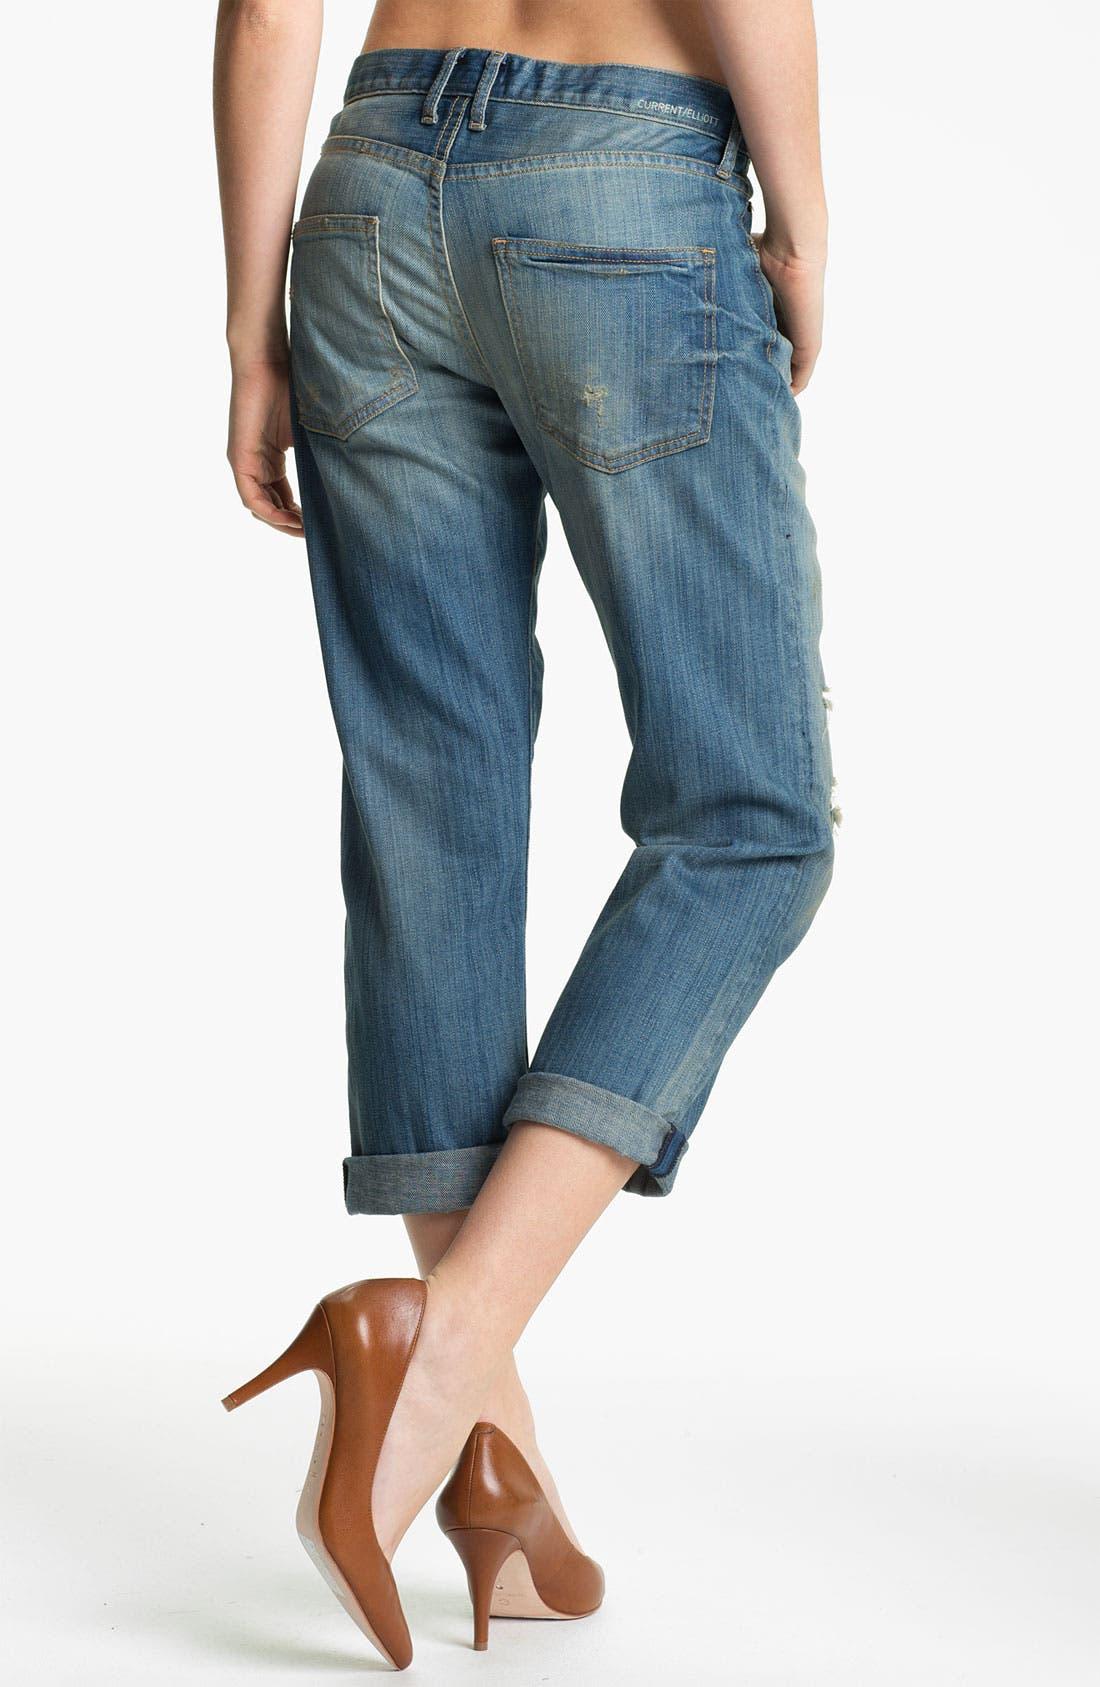 Alternate Image 2  - Current/Elliott 'The Boyfriend Jean' Stretch Jeans (Panhandle with Repair)